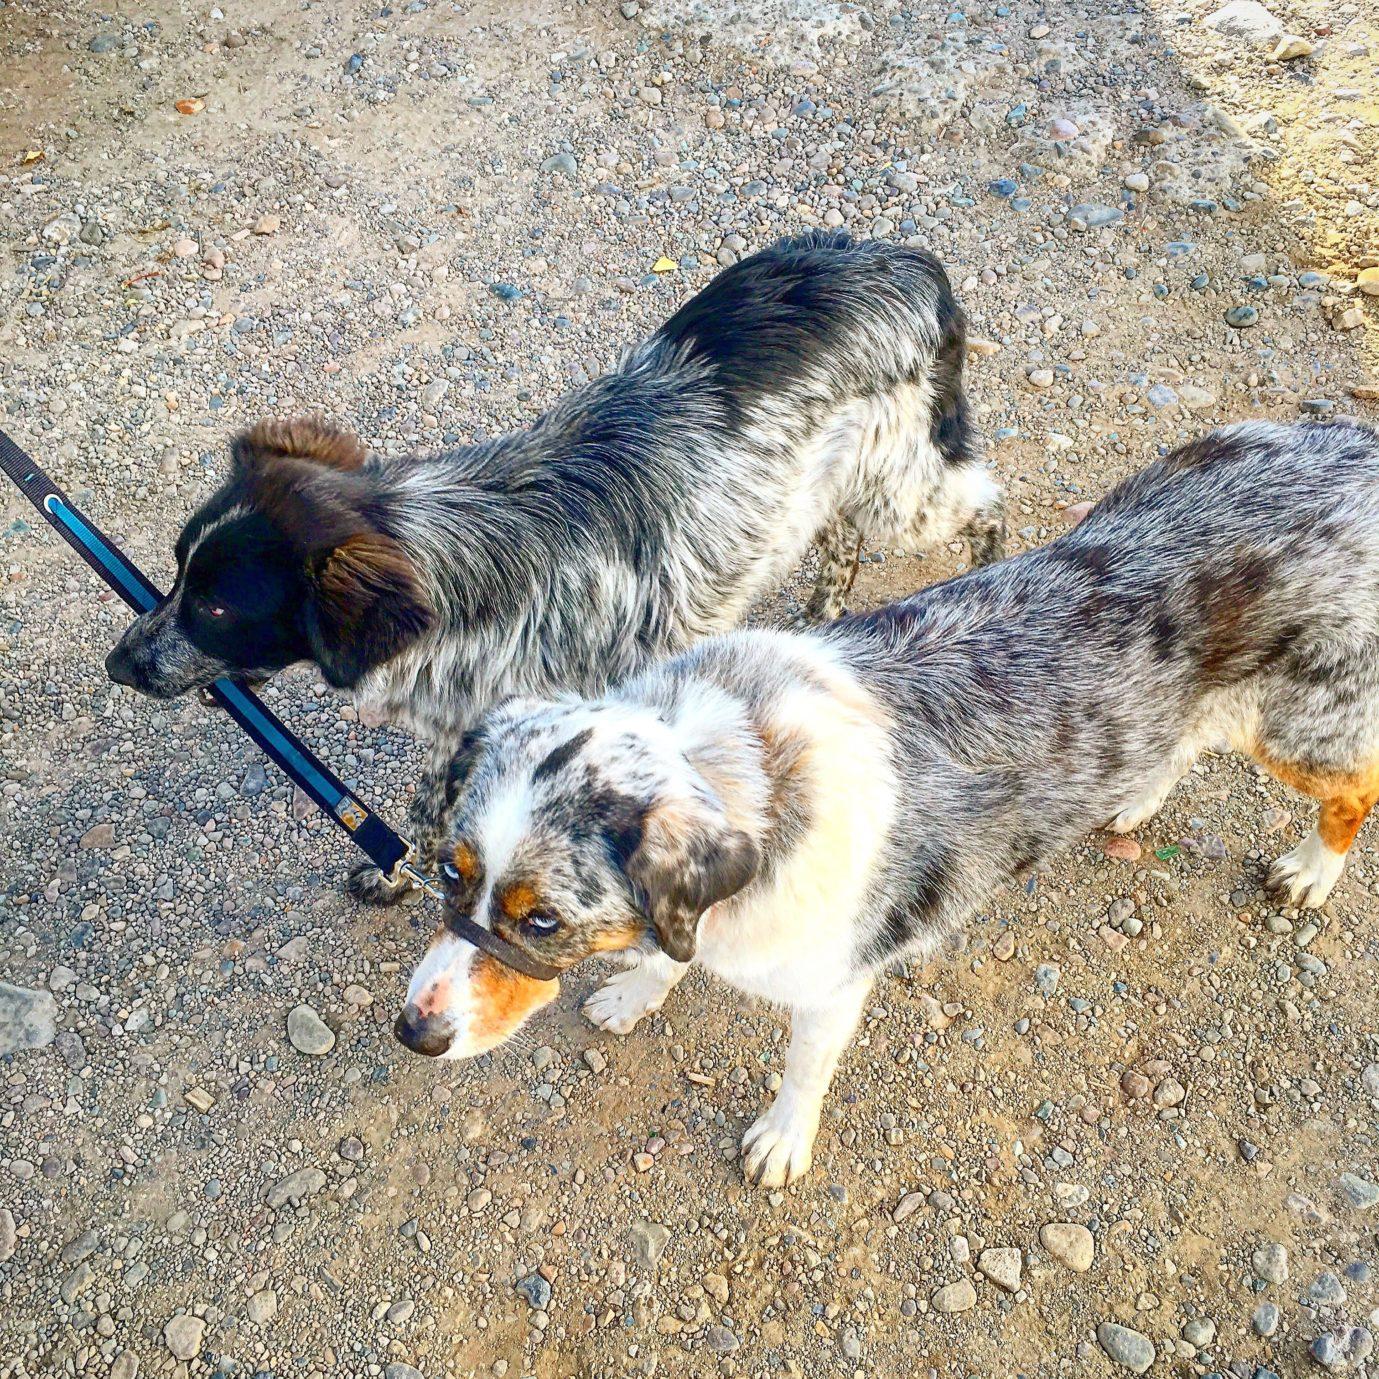 Consider adopting a street dog, like our friend Miranda